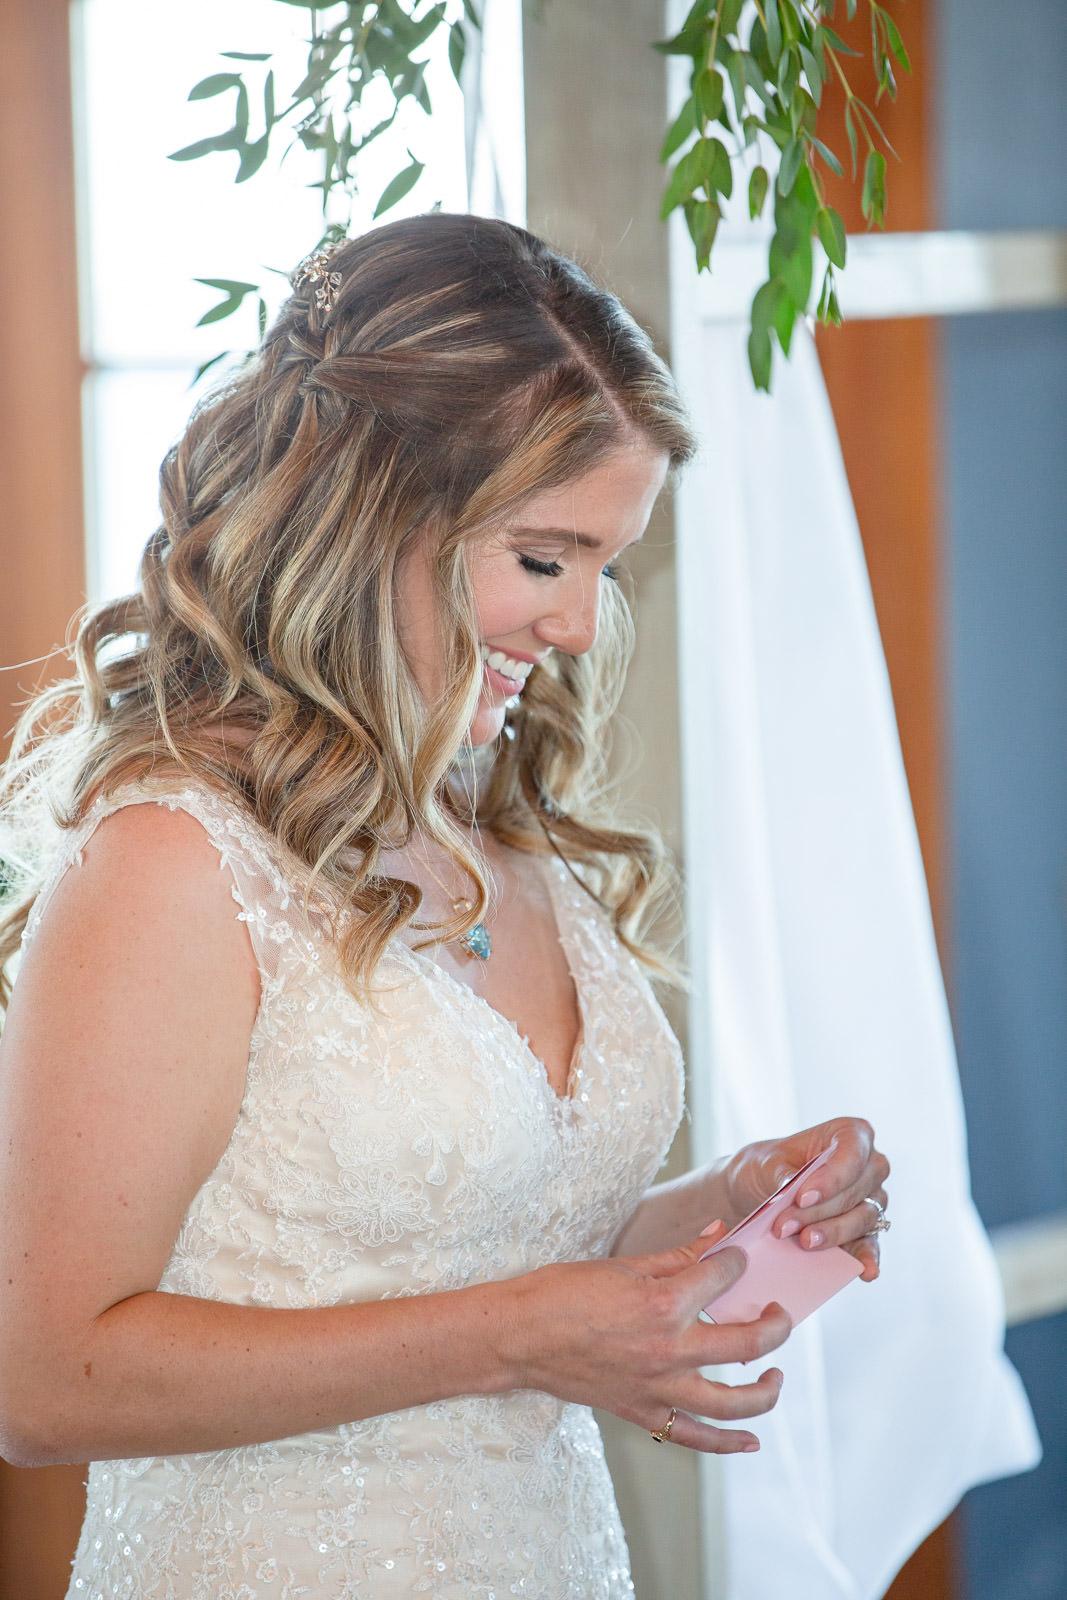 Wedding, Narragansett Towers, The Towers, Narragansett, Rhode Island, RI, Tracy Jenkins photography, RI wedding photographer, Rhode Island wedding photographer, wedding ceremony, reading vows